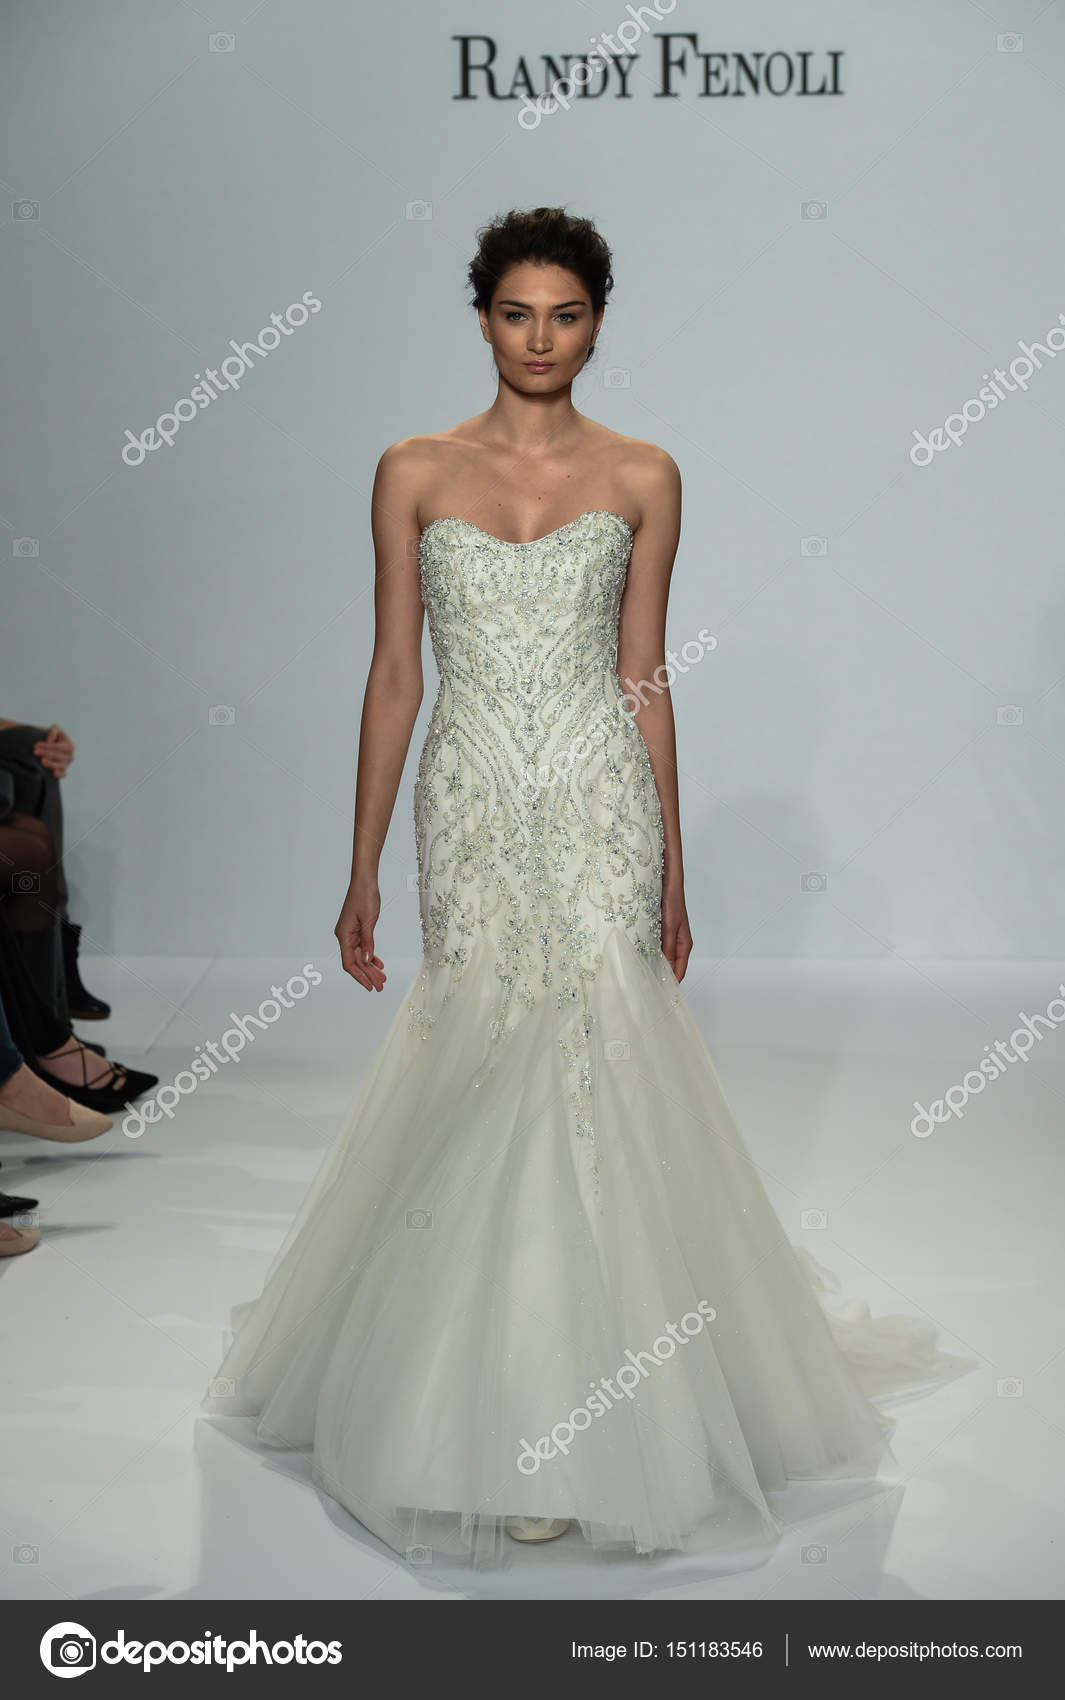 Voir La Randy Fenoli Bridal Photo éditoriale Fashionstock 151183546